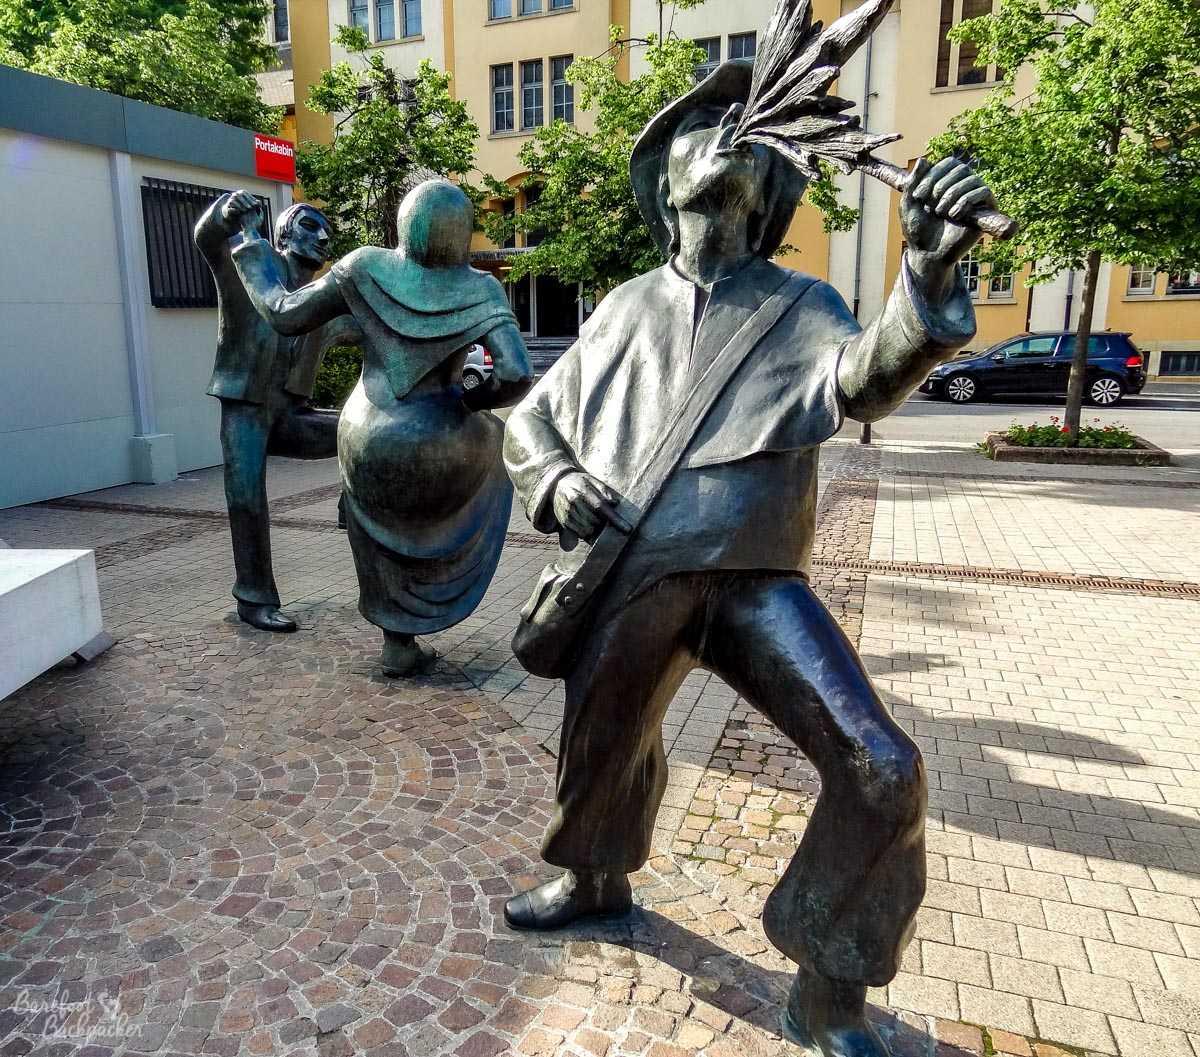 Entertainer sculptures